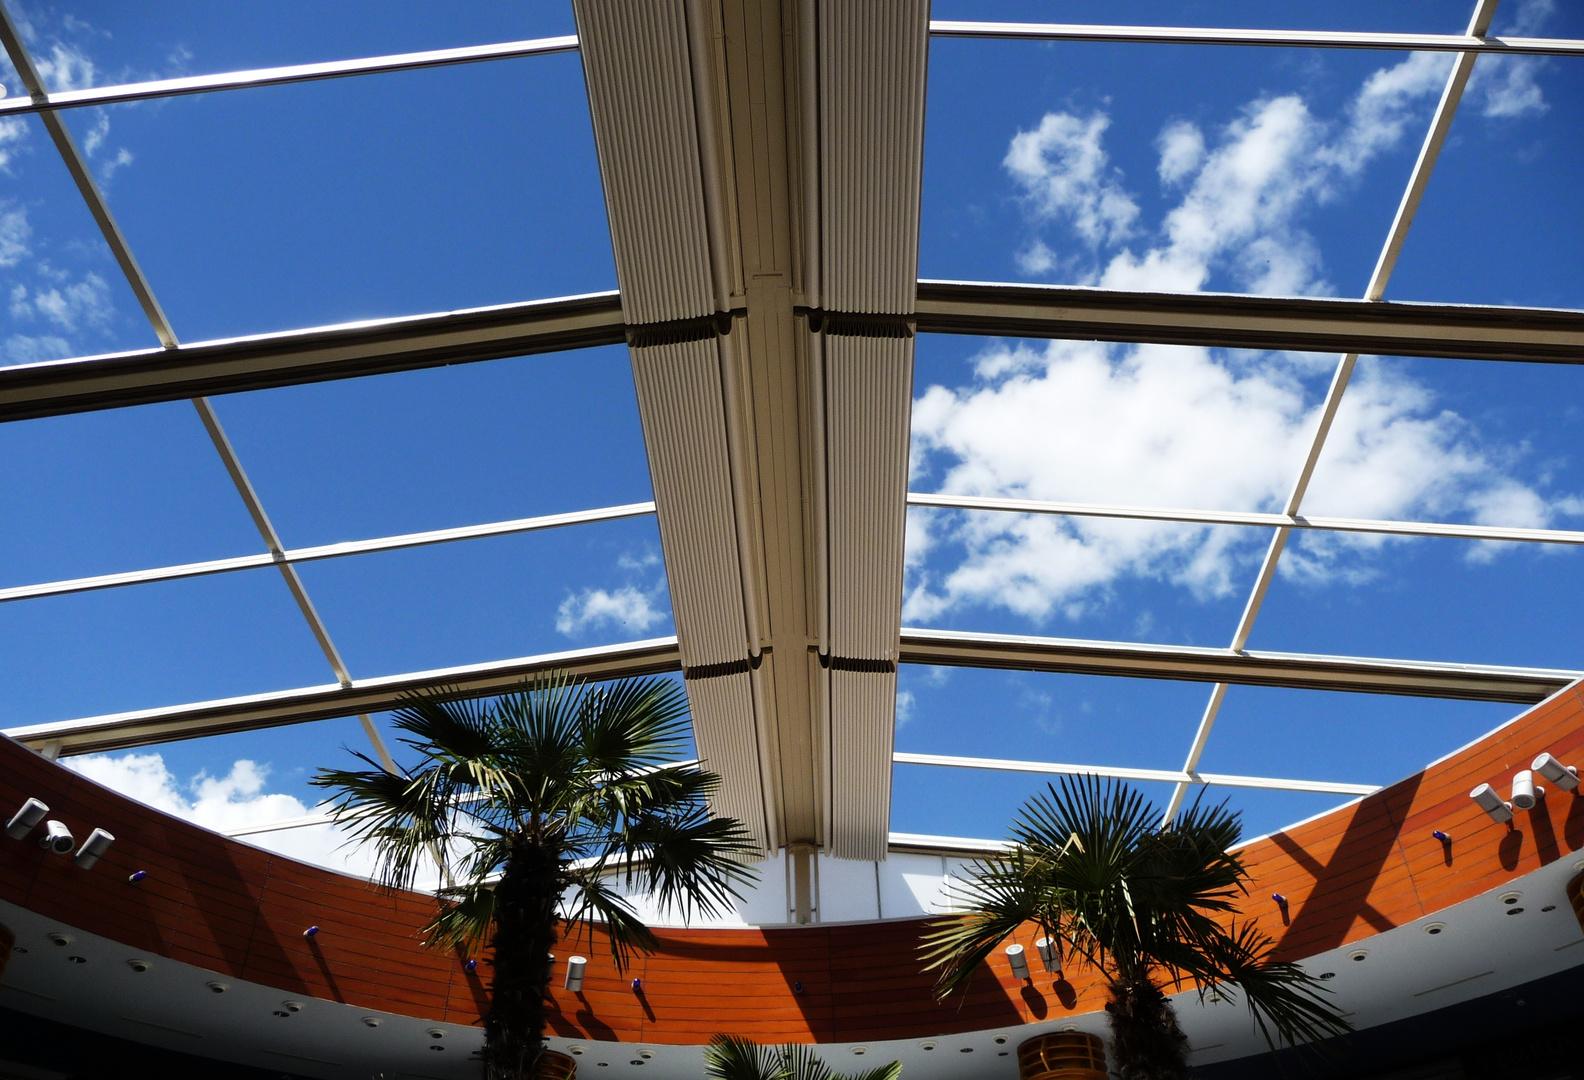 Roof 2, Cosmos Mall, Thessaloniki, Greece